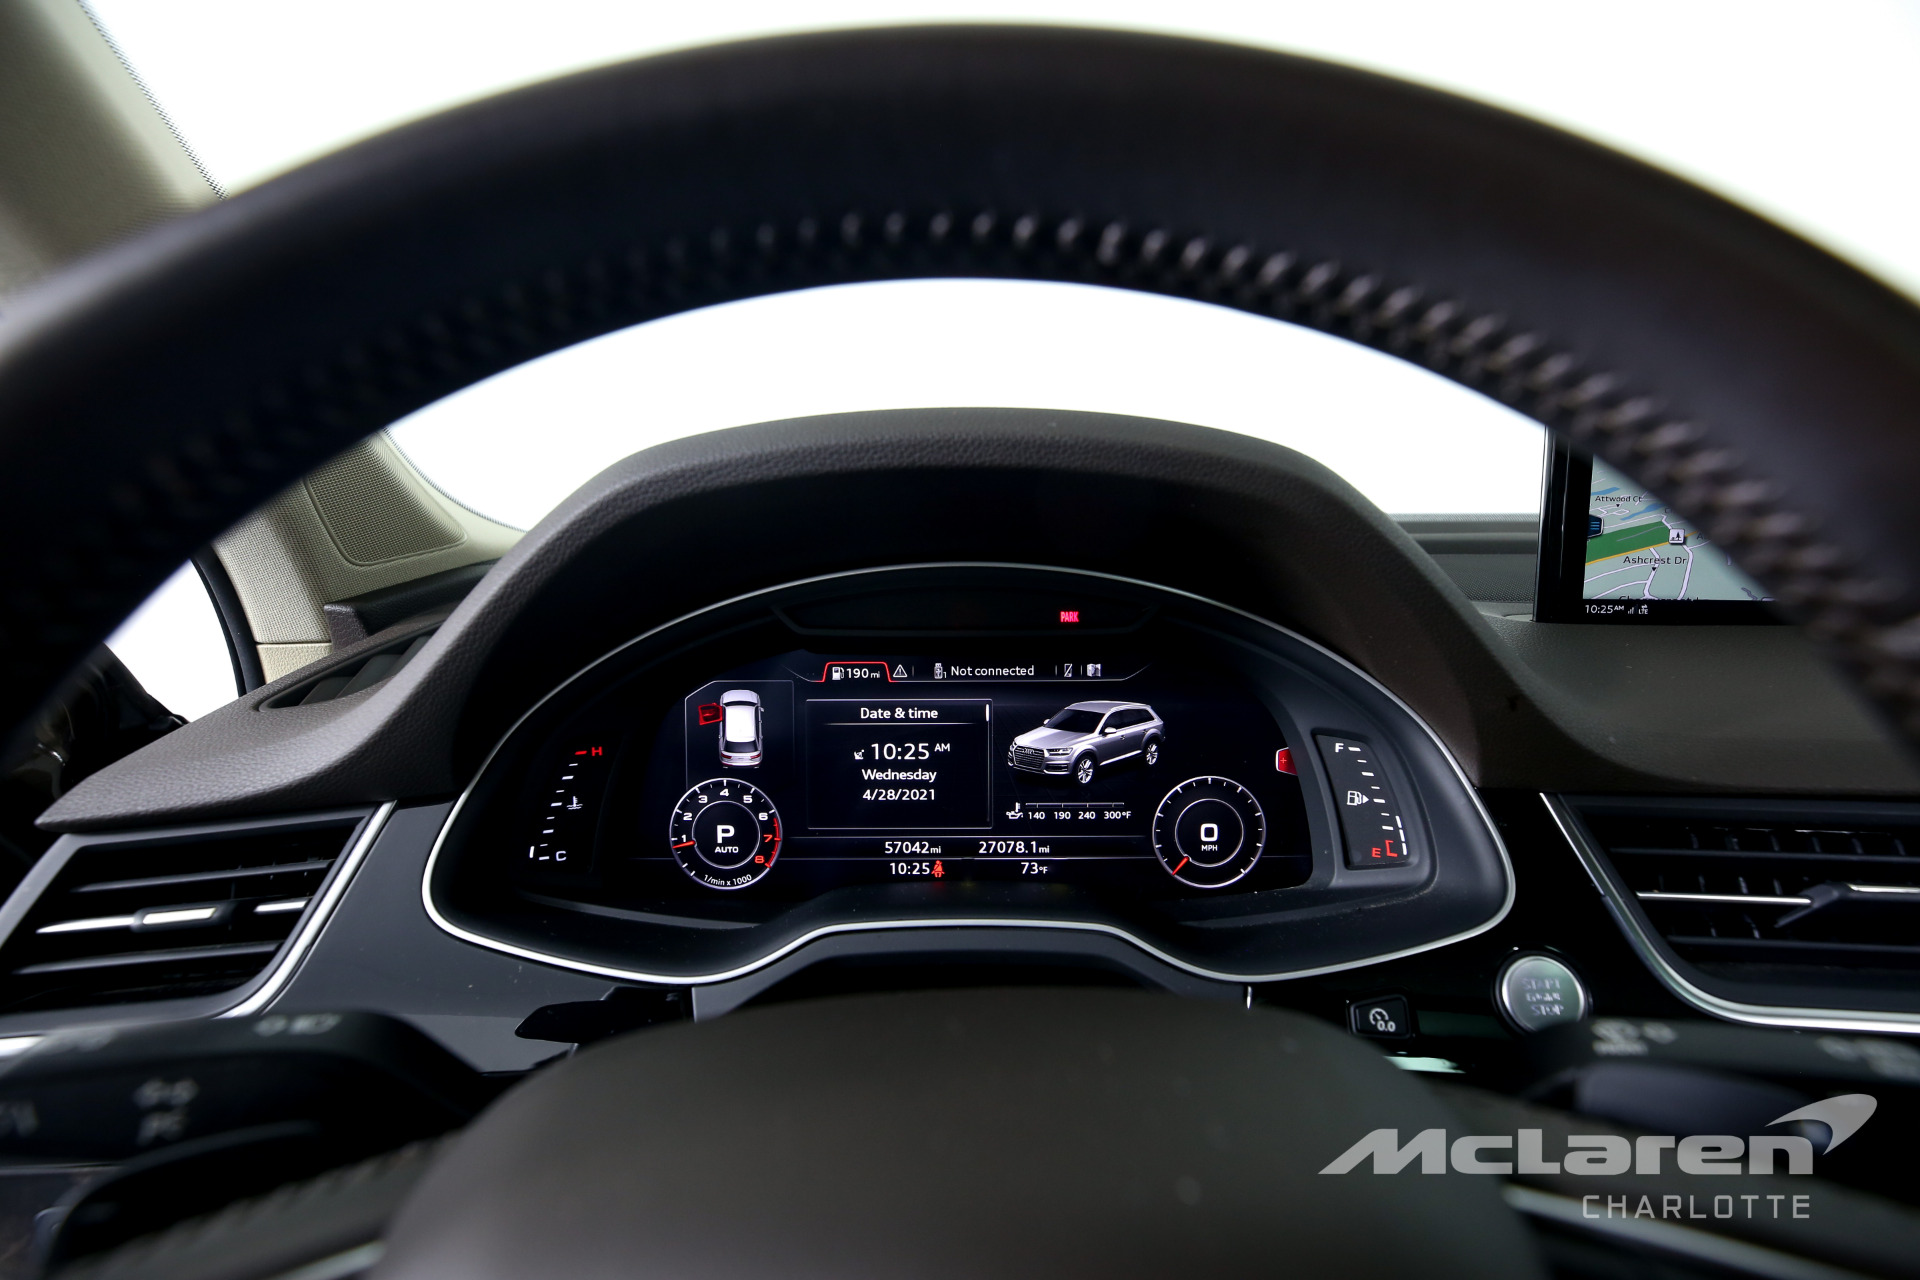 Used 2017 Audi Q7 3.0T quattro Prestige | Charlotte, NC